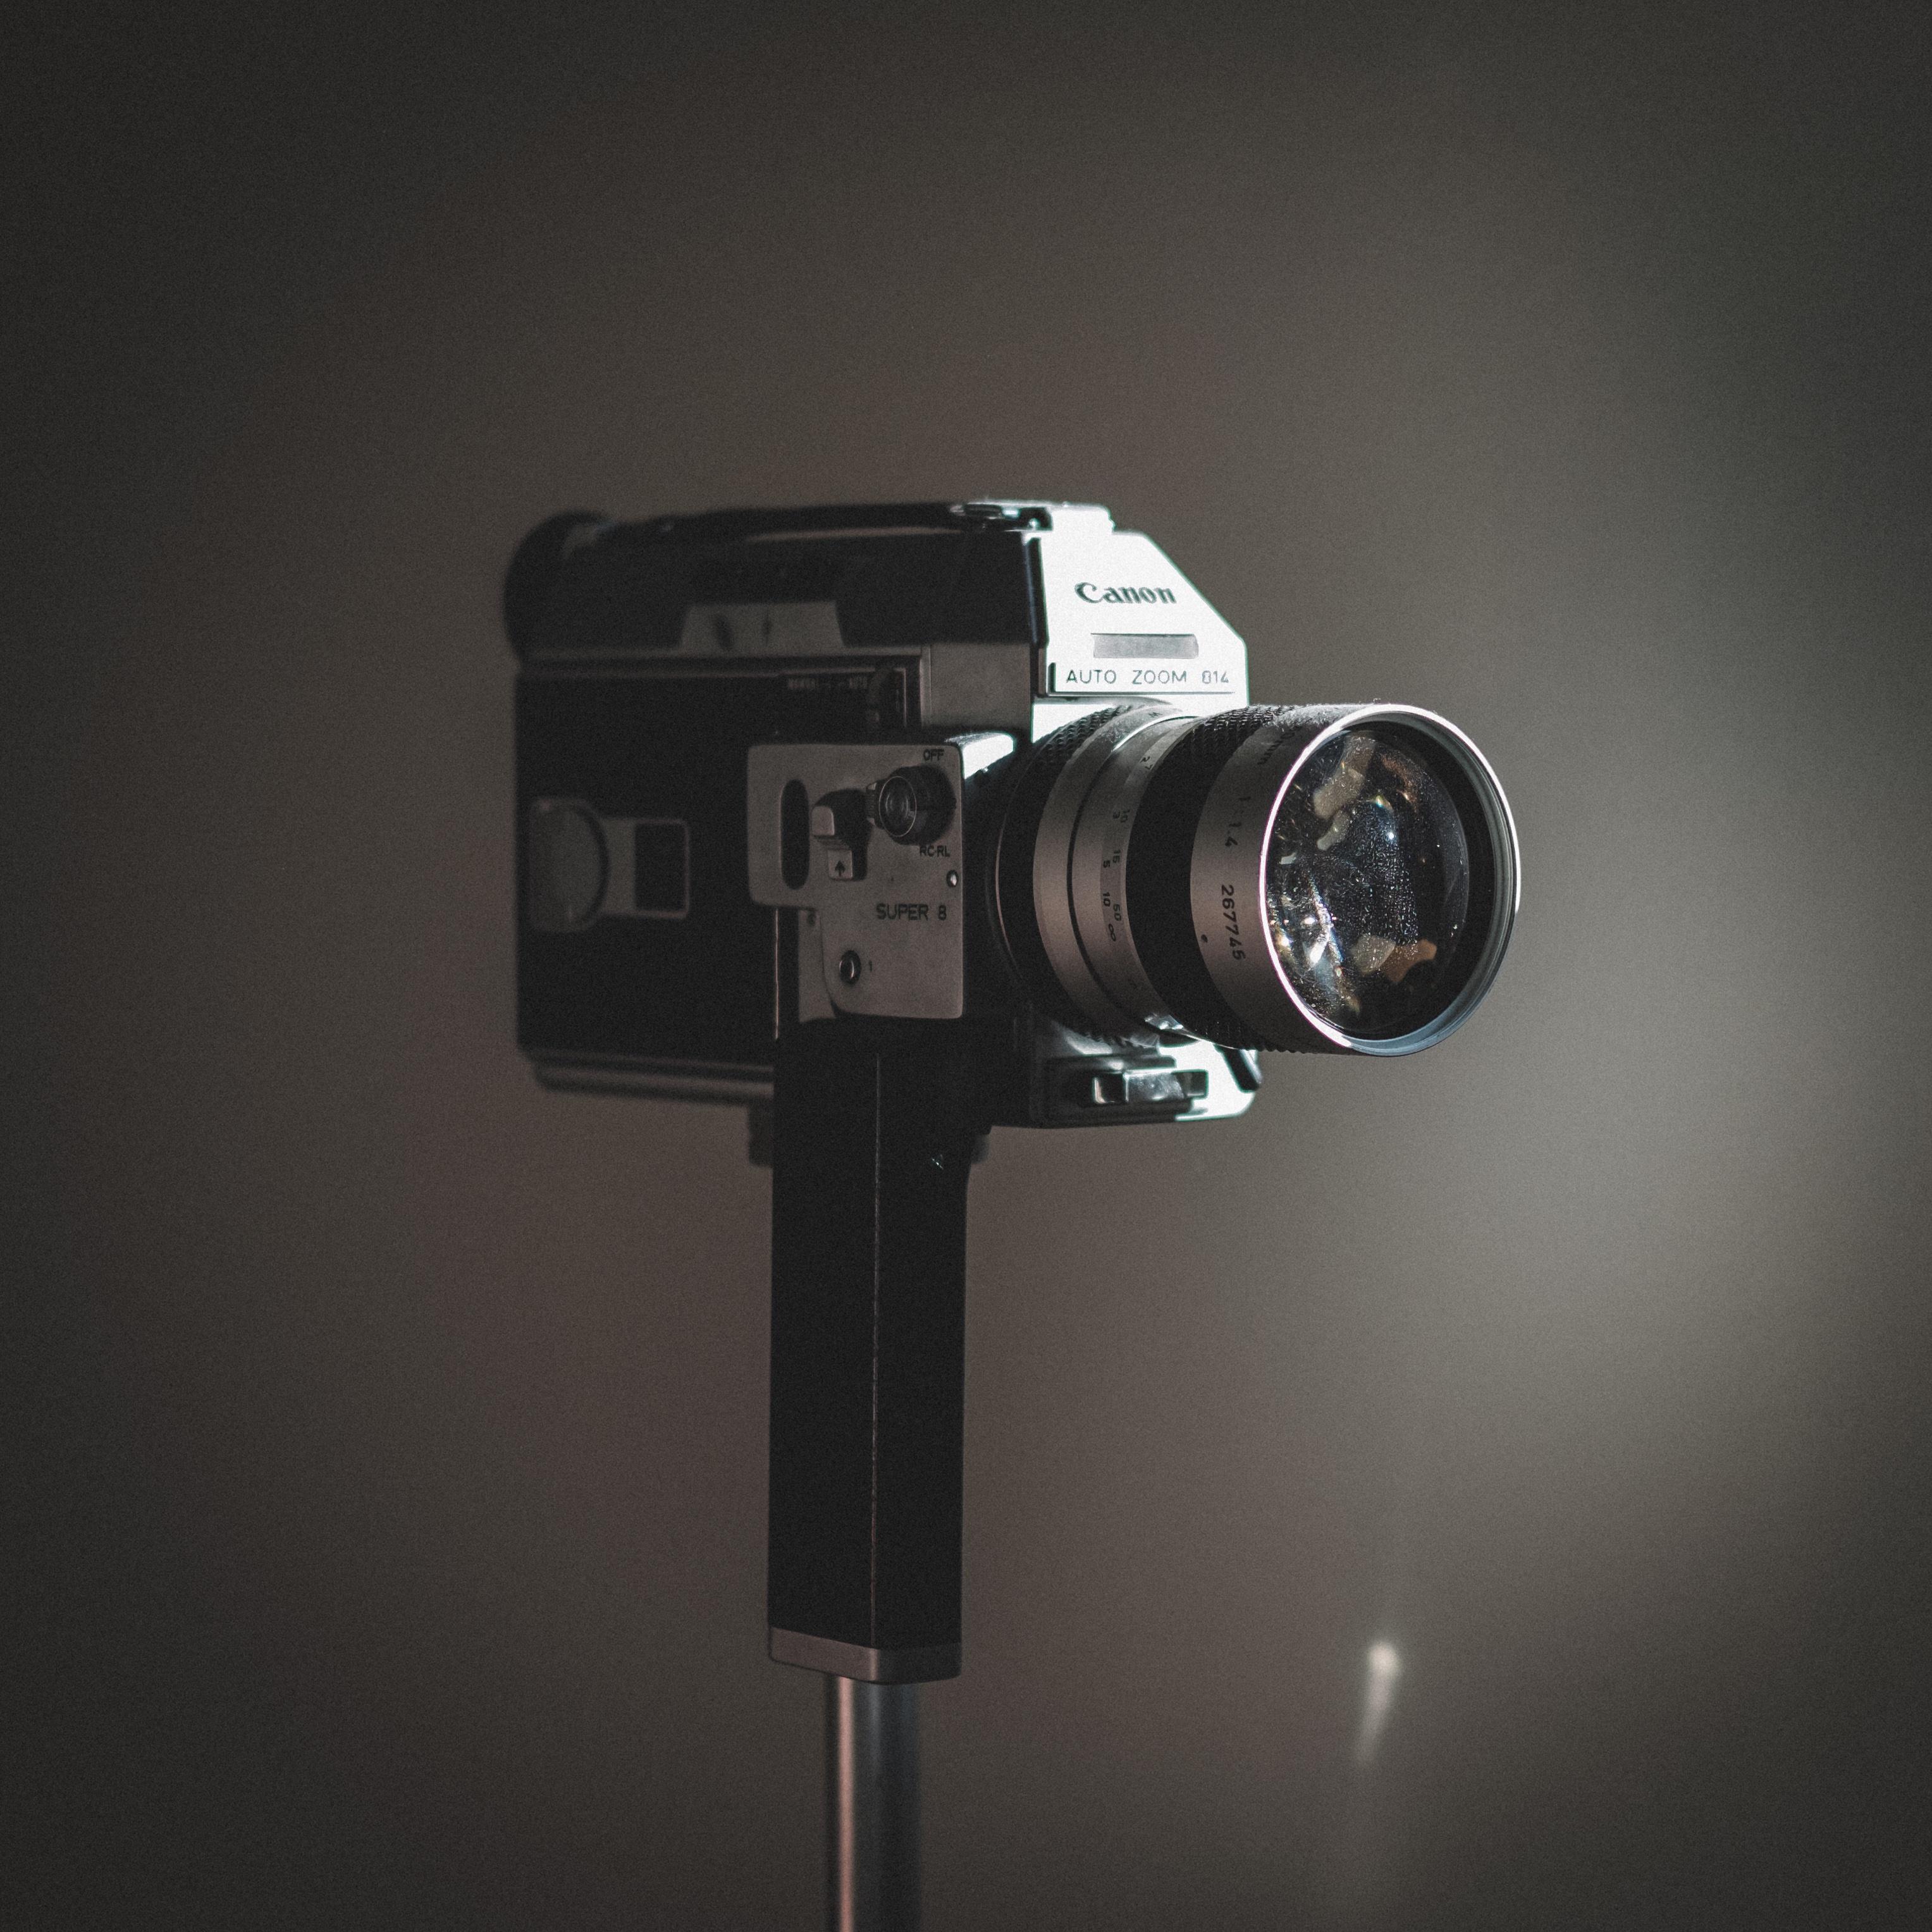 Camera Light Fixture: Free Images : White, Lamp, Lighting, Product, Light